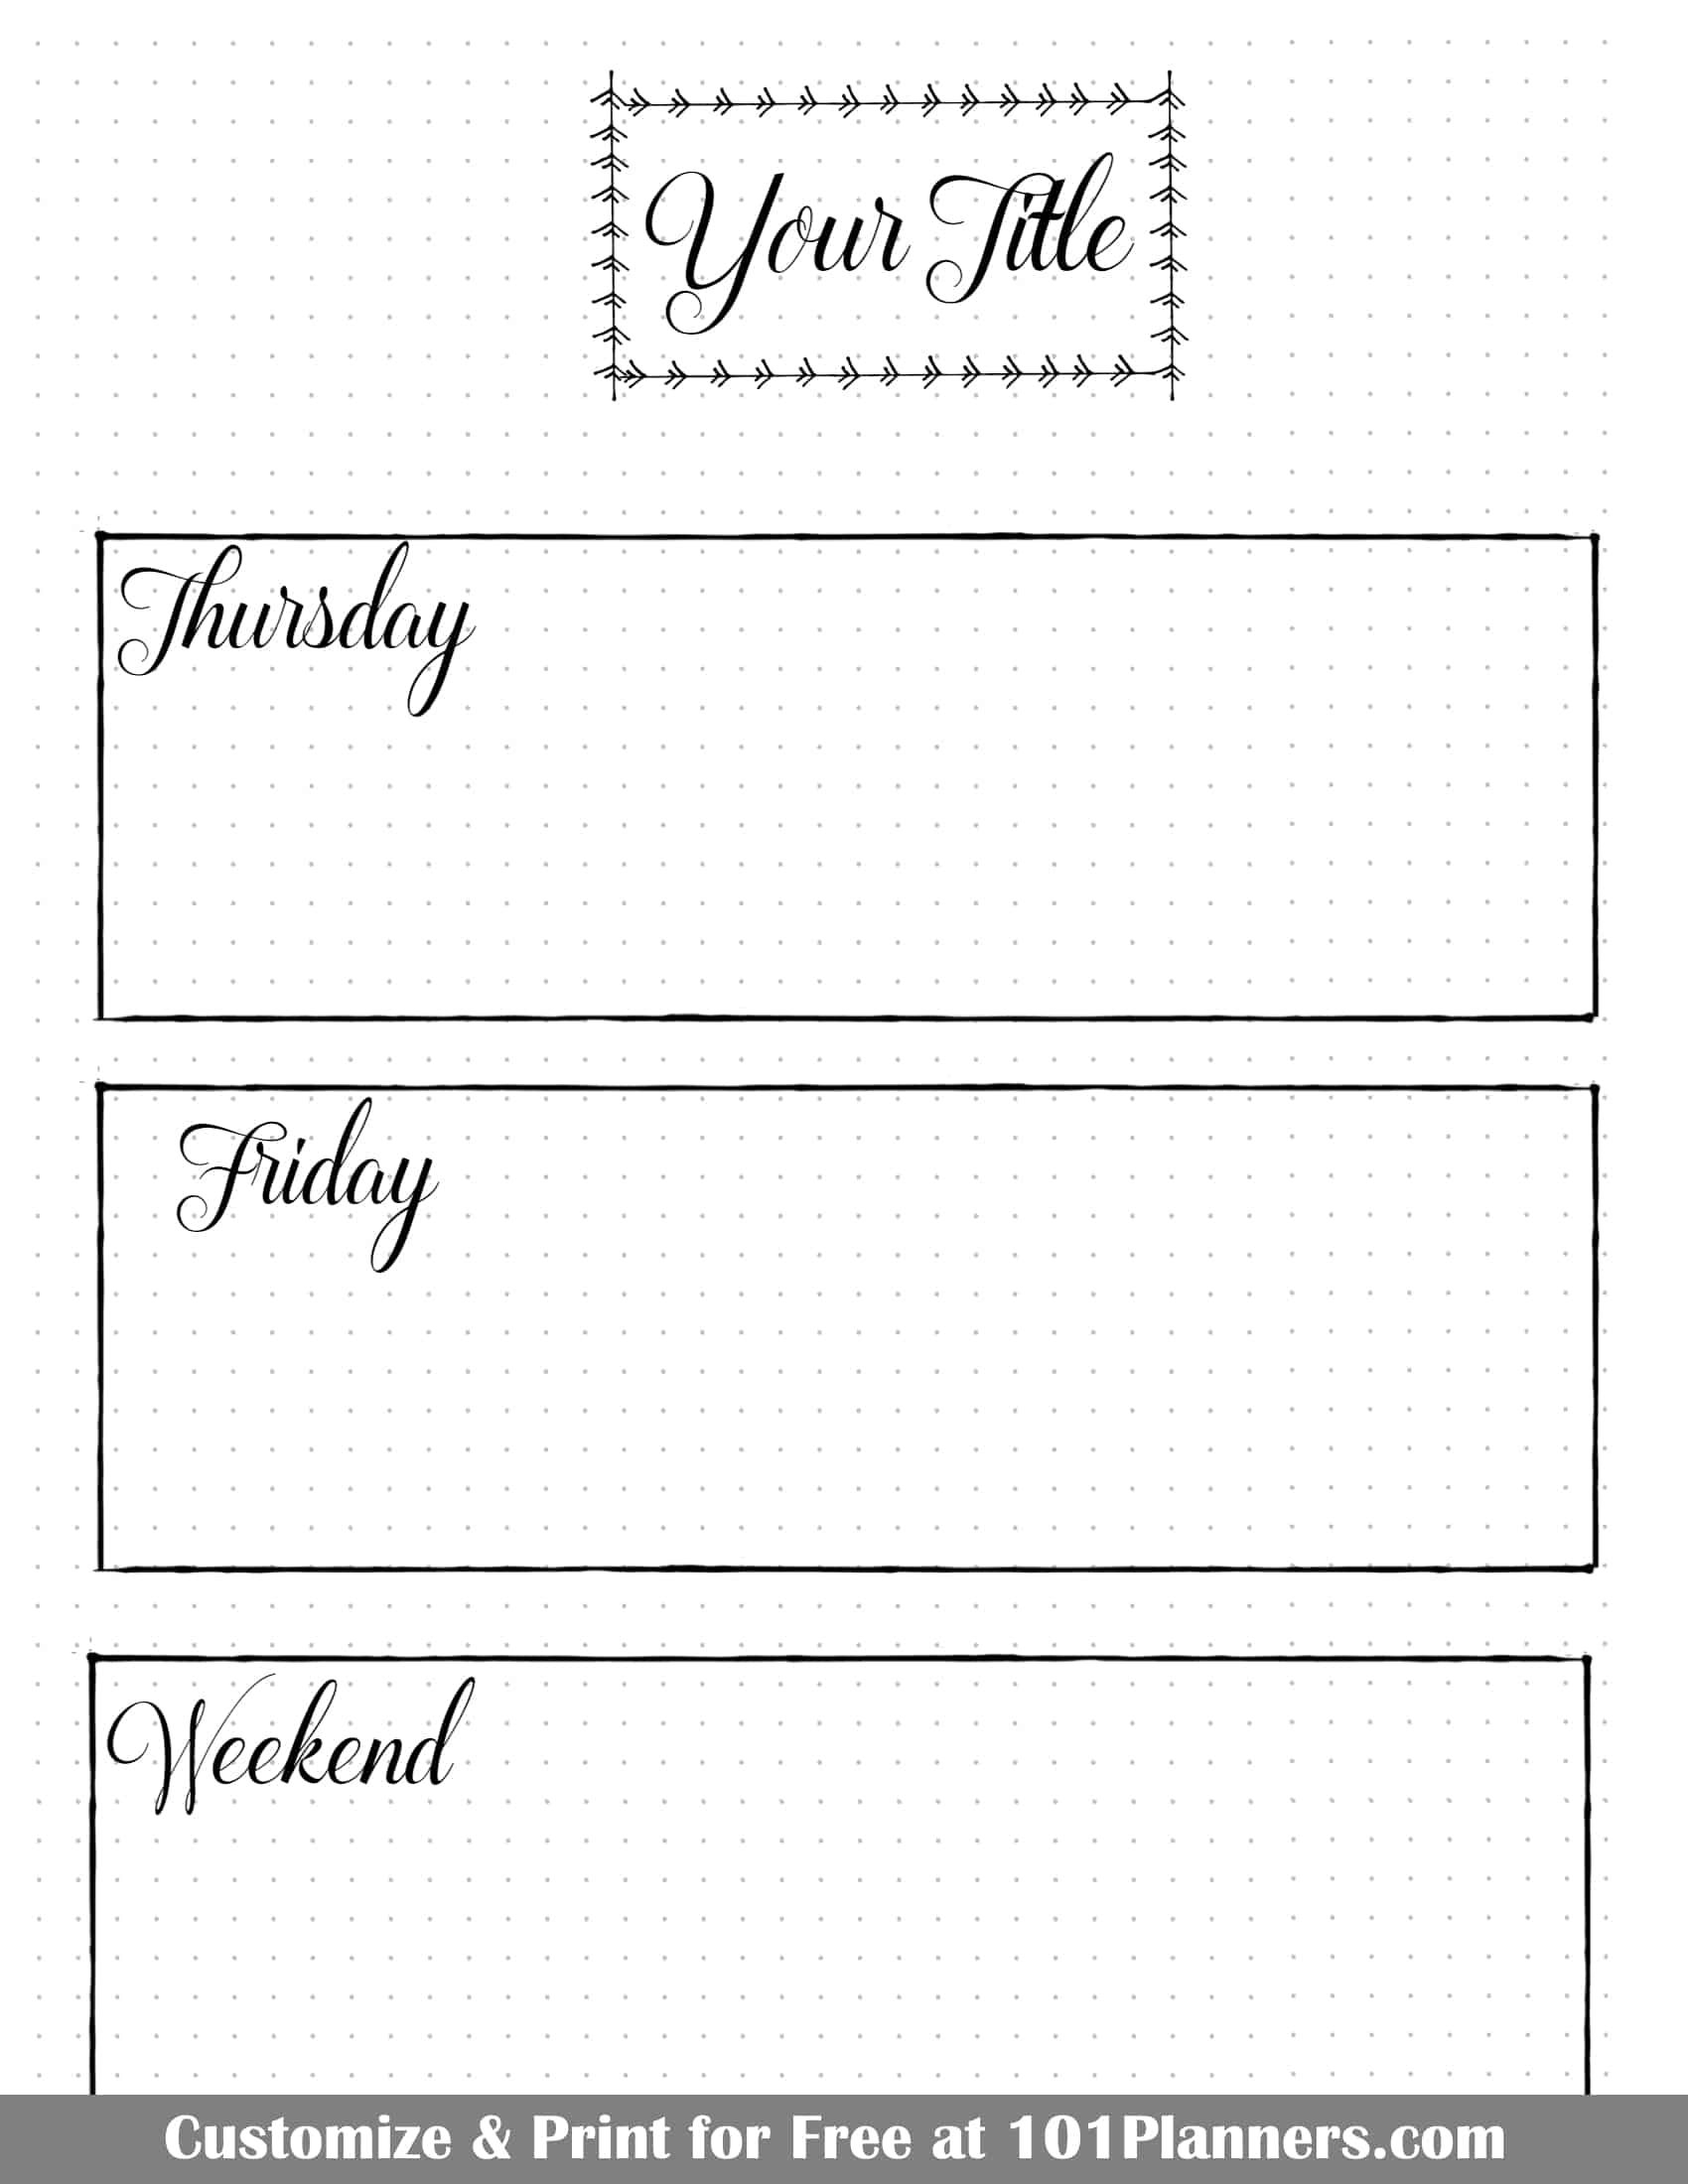 bullet journal calendar | free customizable printable